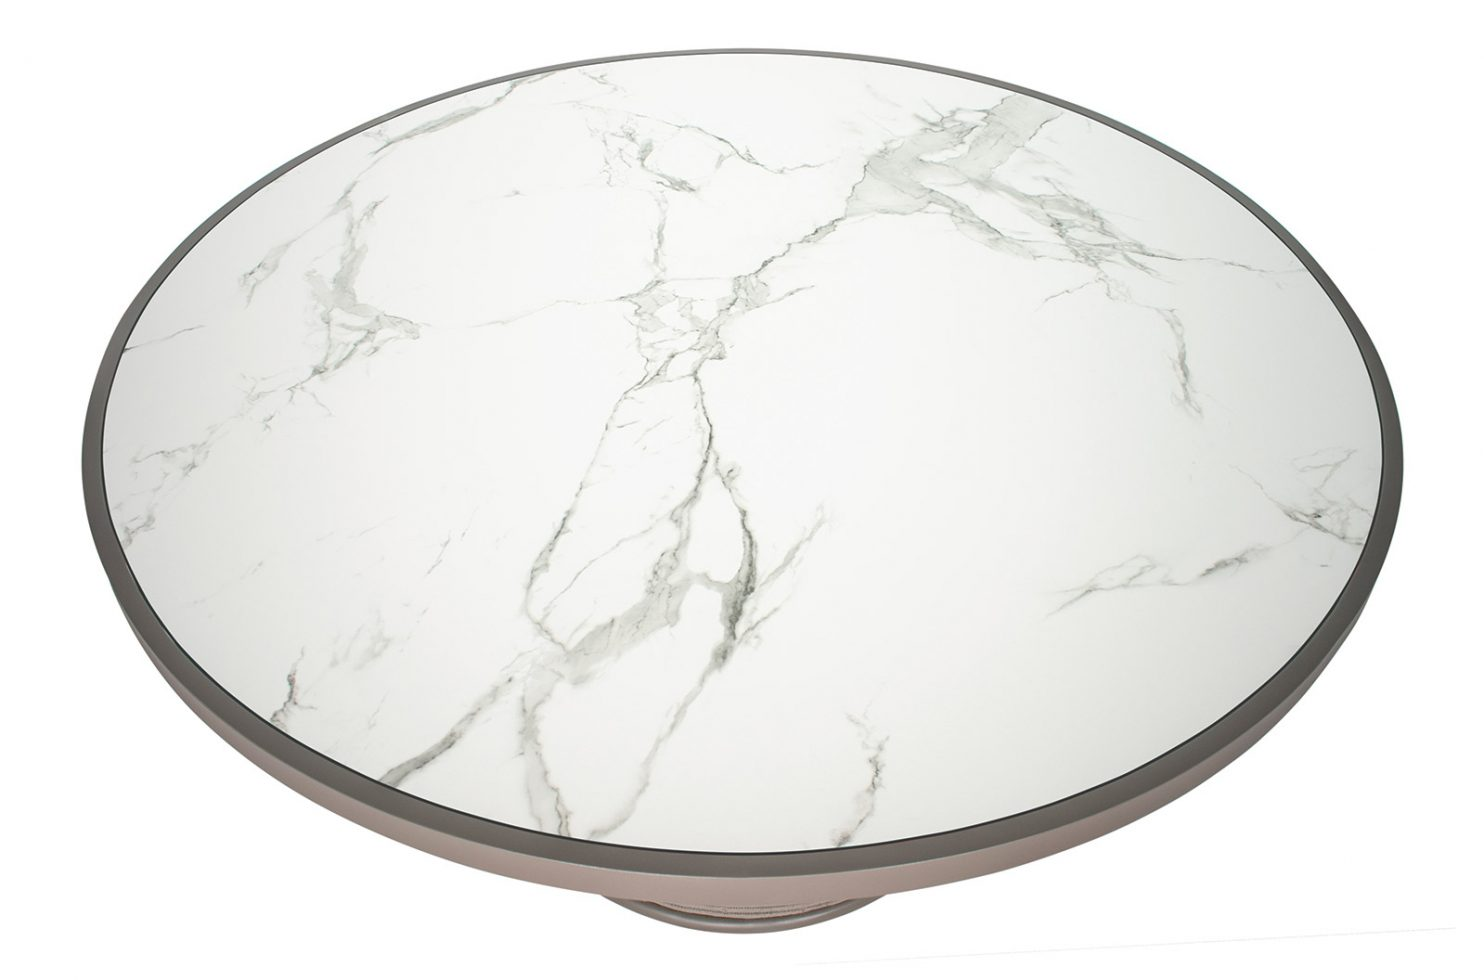 Archipelago alexander table 620FT100P2BBT CWA 1 top